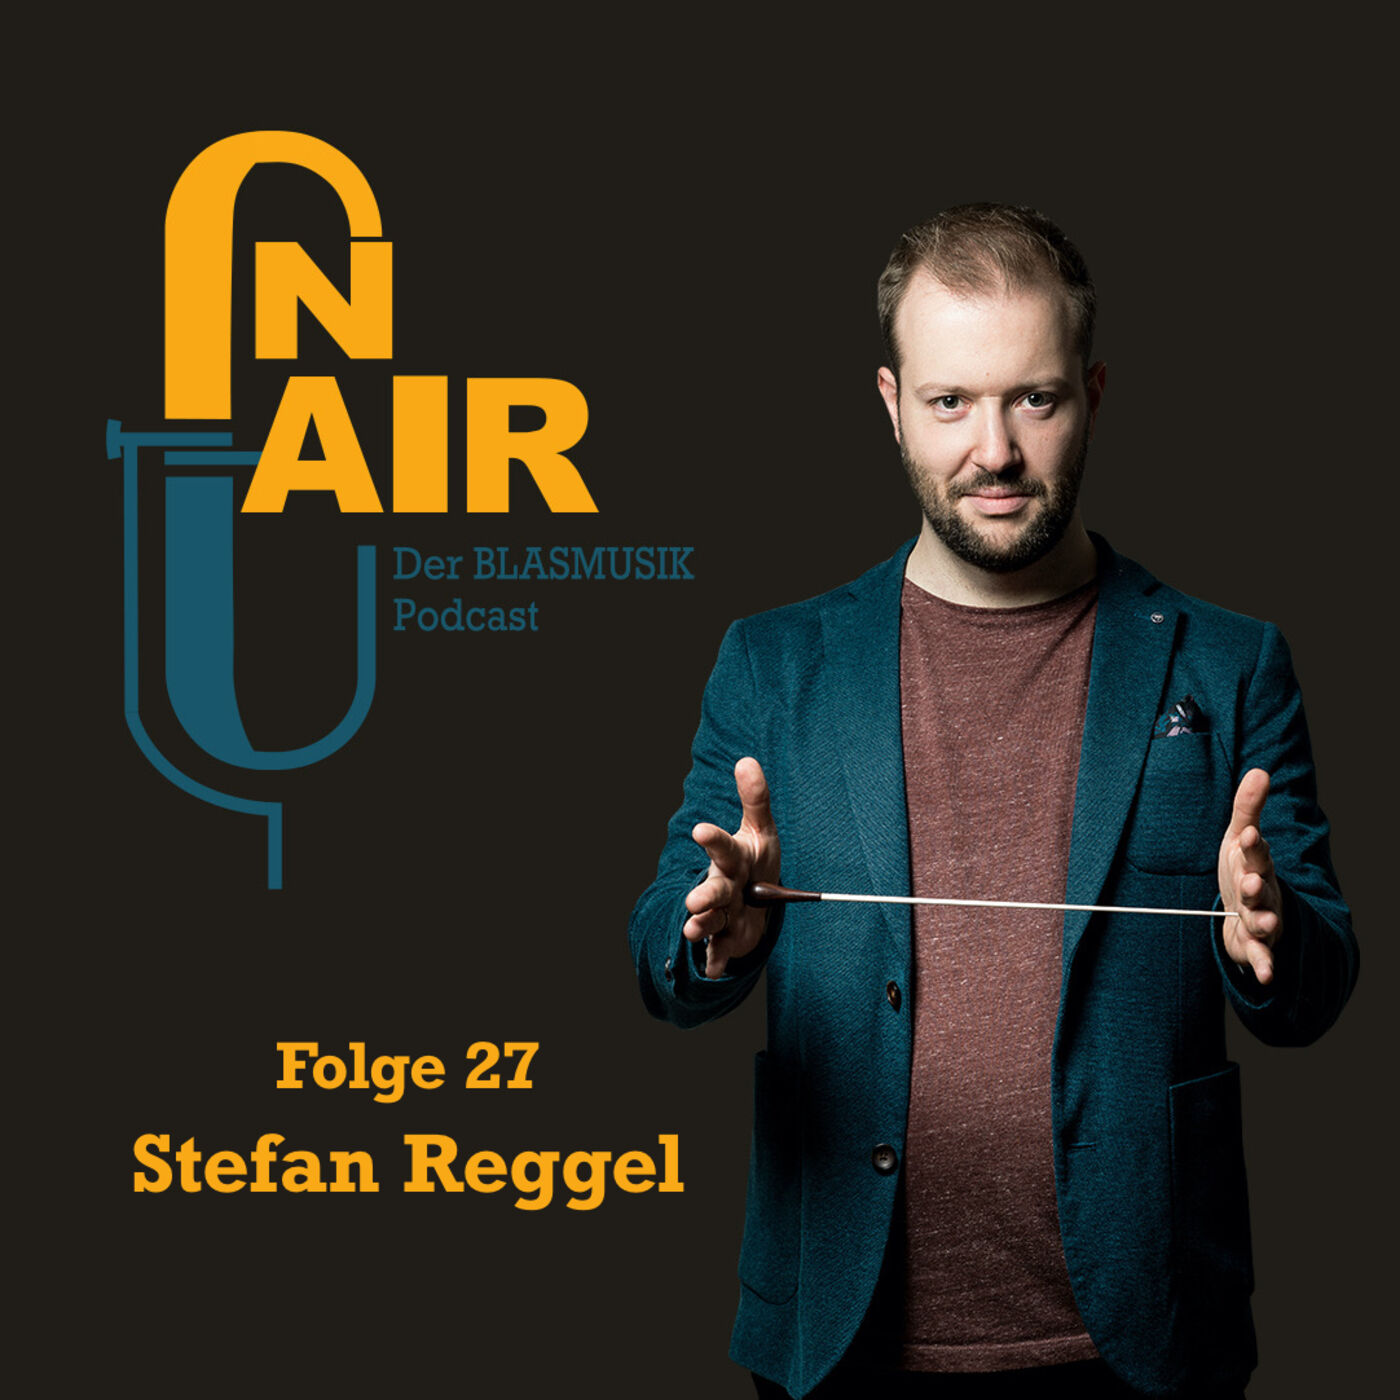 Stefan Reggel - Musik geht nicht nur um Musik, sondern um das ganze Leben